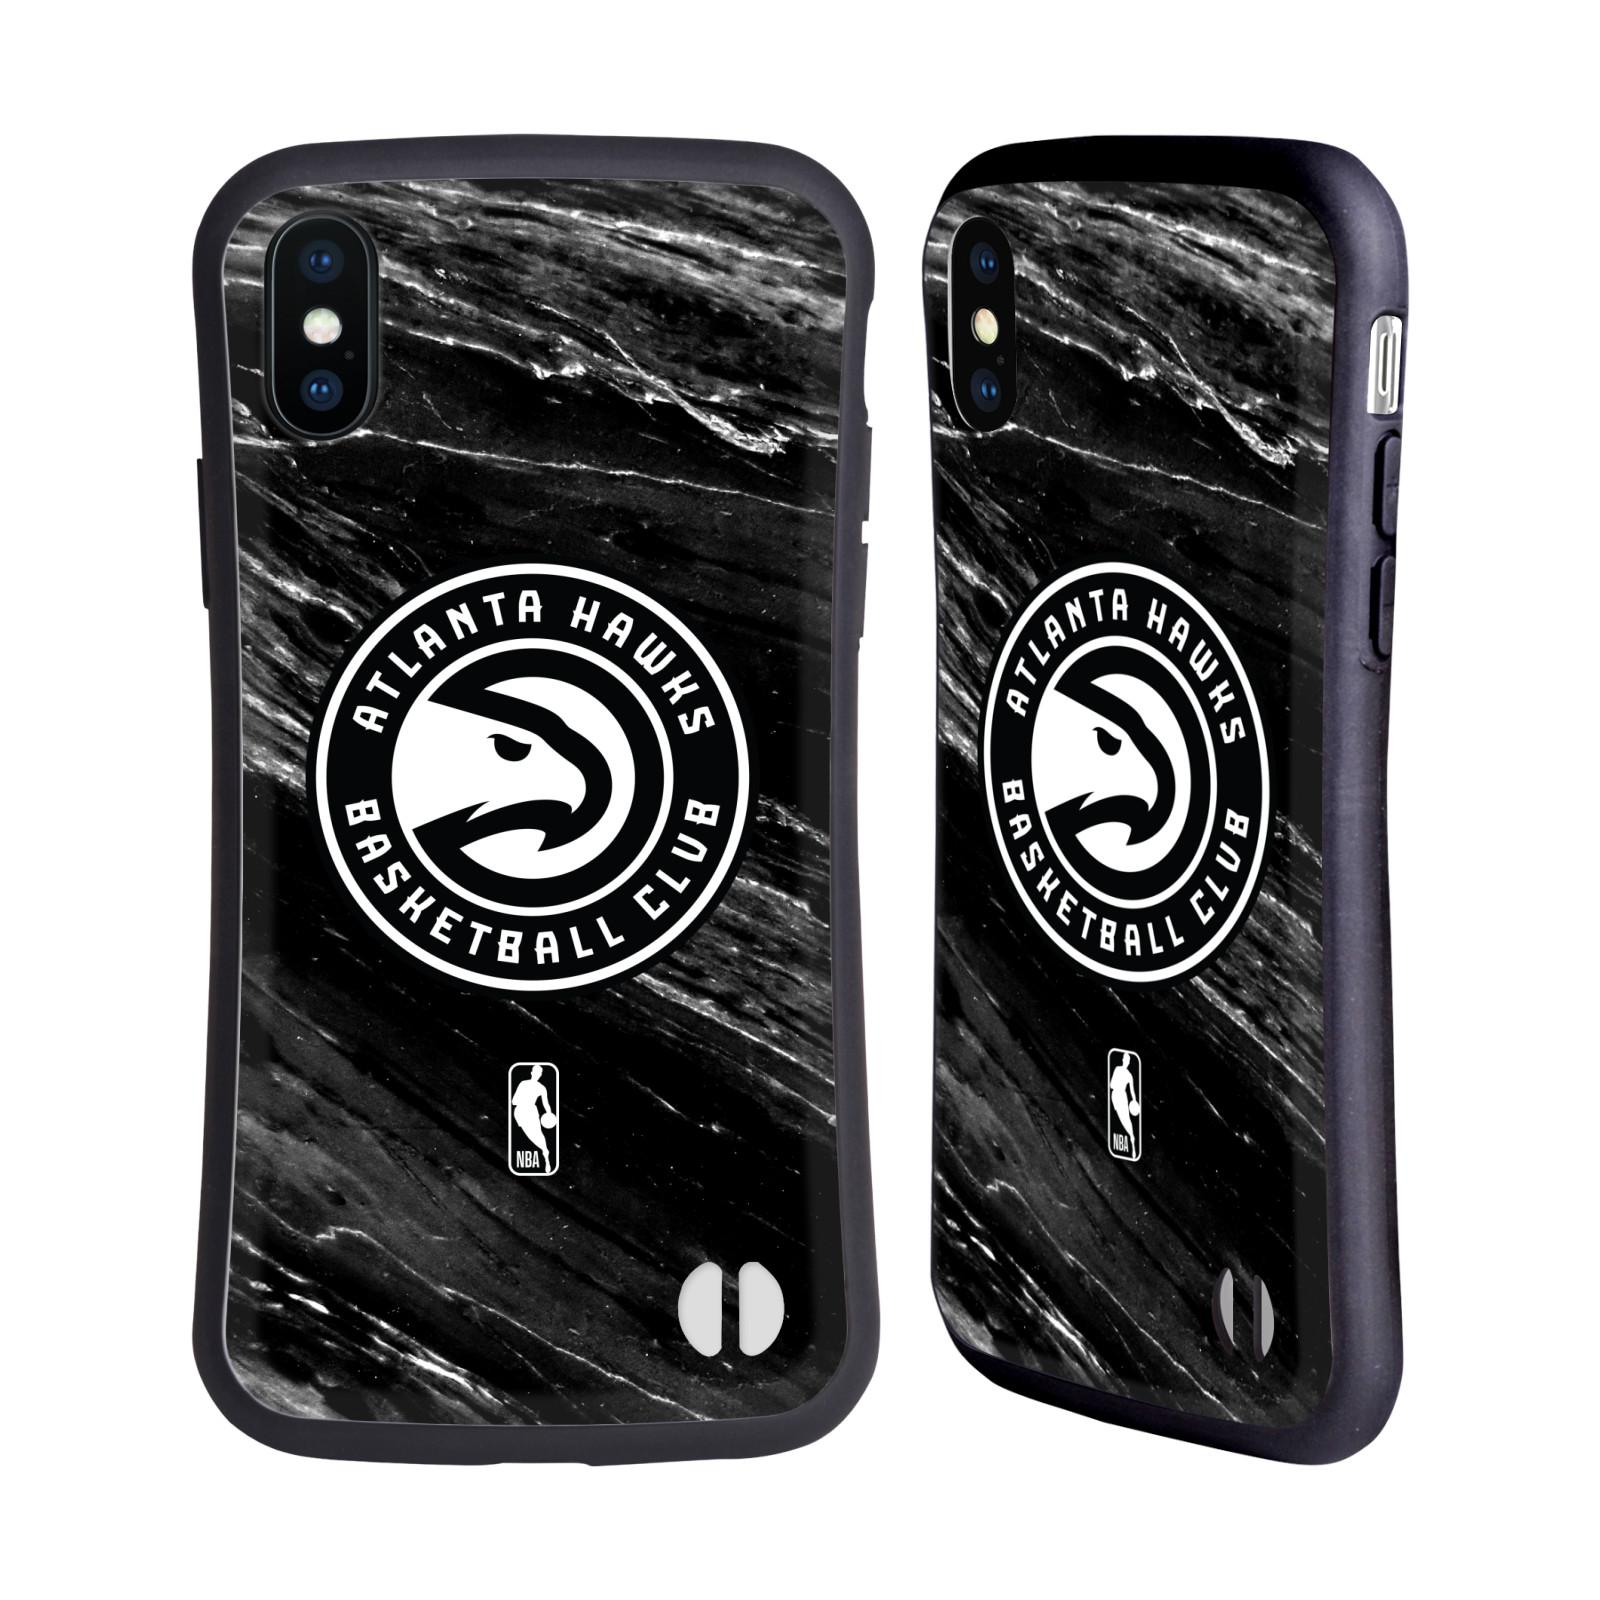 OFFICIAL-NBA-ATLANTA-HAWKS-HYBRID-CASE-FOR-APPLE-iPHONES-PHONES